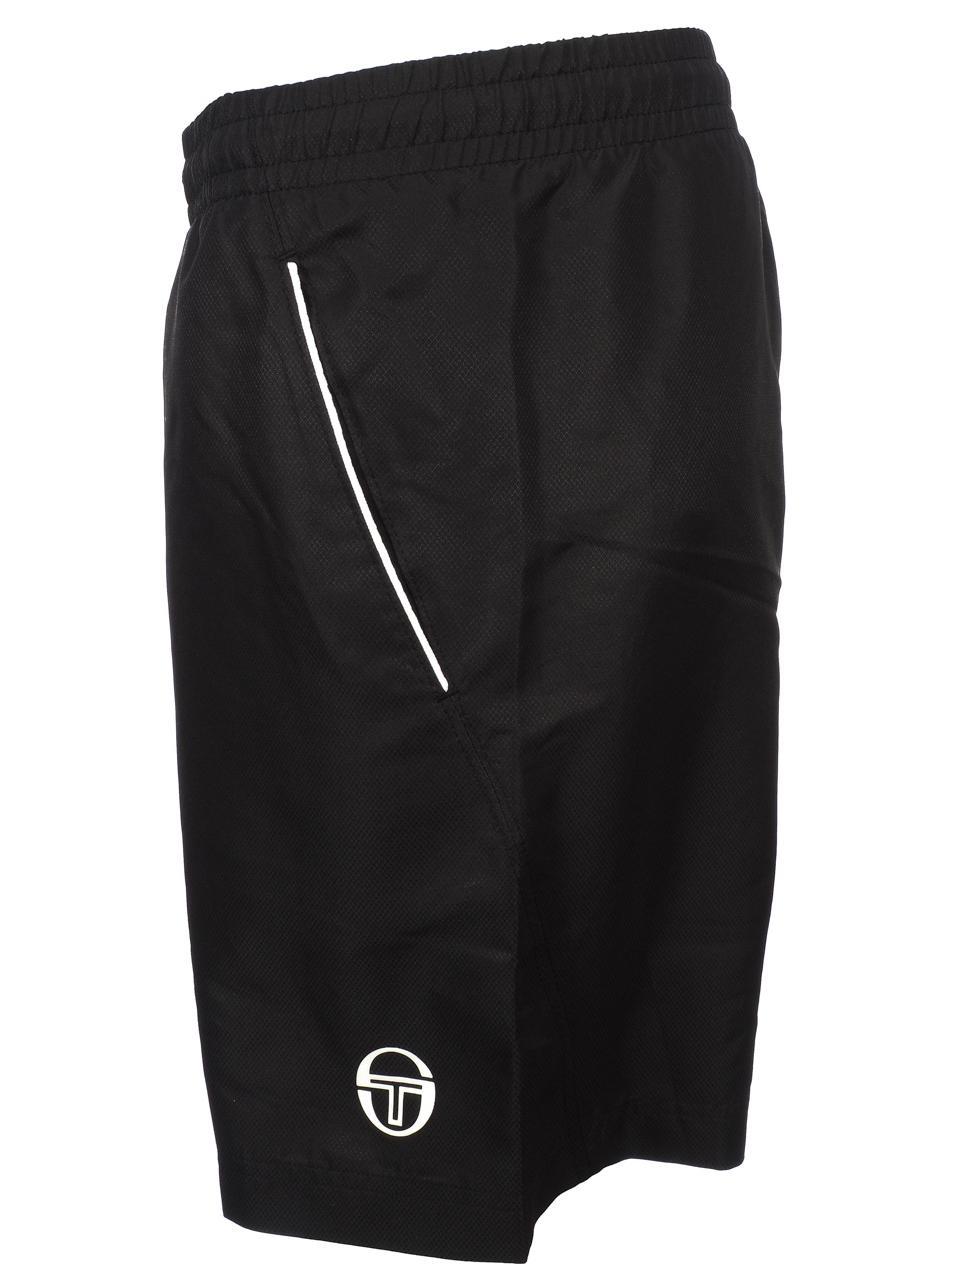 Bermuda-Shorts-Sergio-Tacchini-Rob-017-Black-Black-Shorts-45018-New thumbnail 2